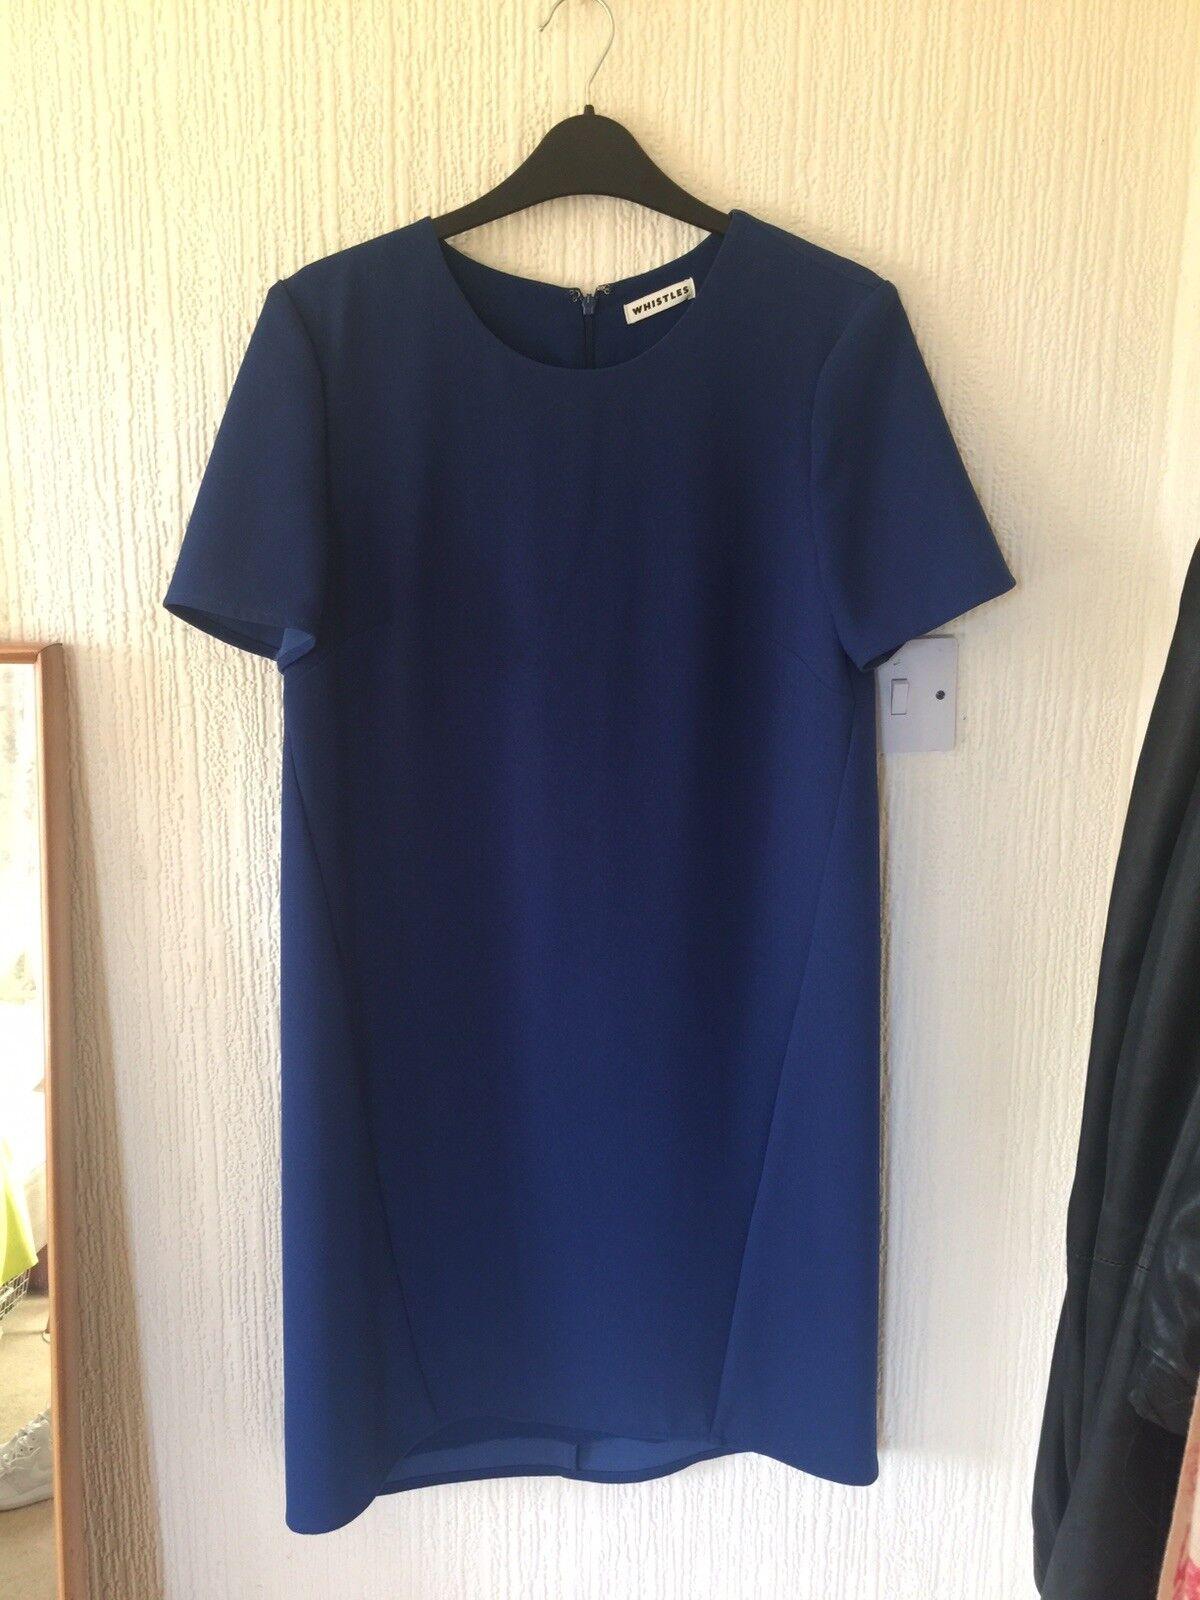 Whistles Blau Crepe Shift Dress Brand New Größe 10 Excellent Condition